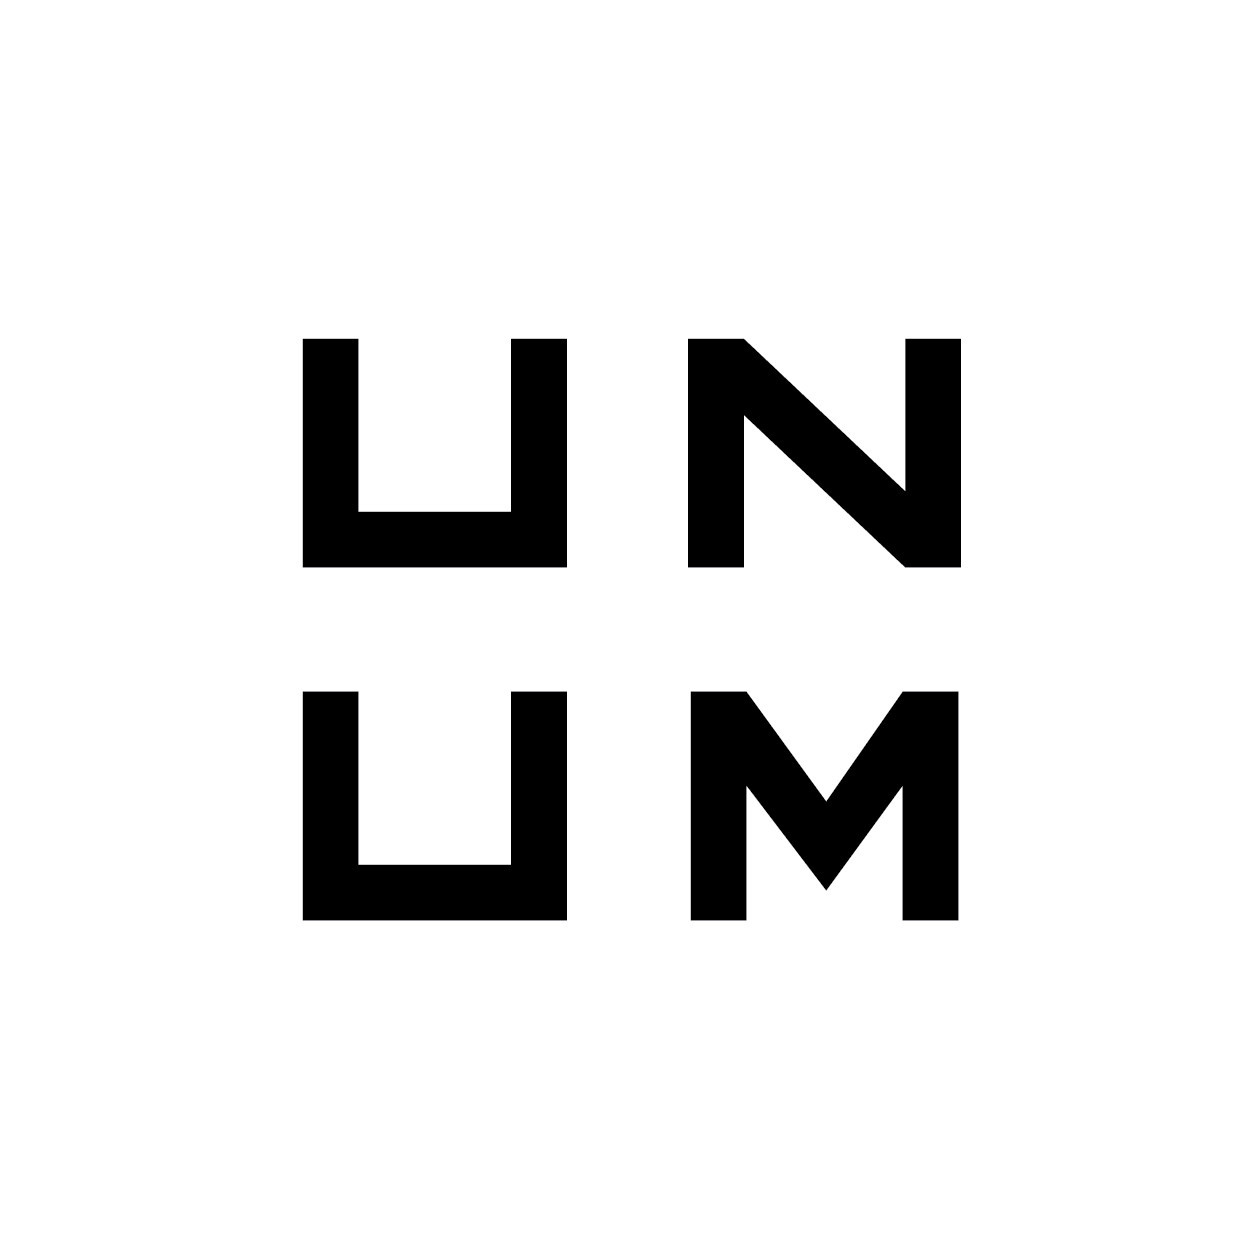 IG排版app推薦-UNUM-鯊客科技SEO網頁設計公司